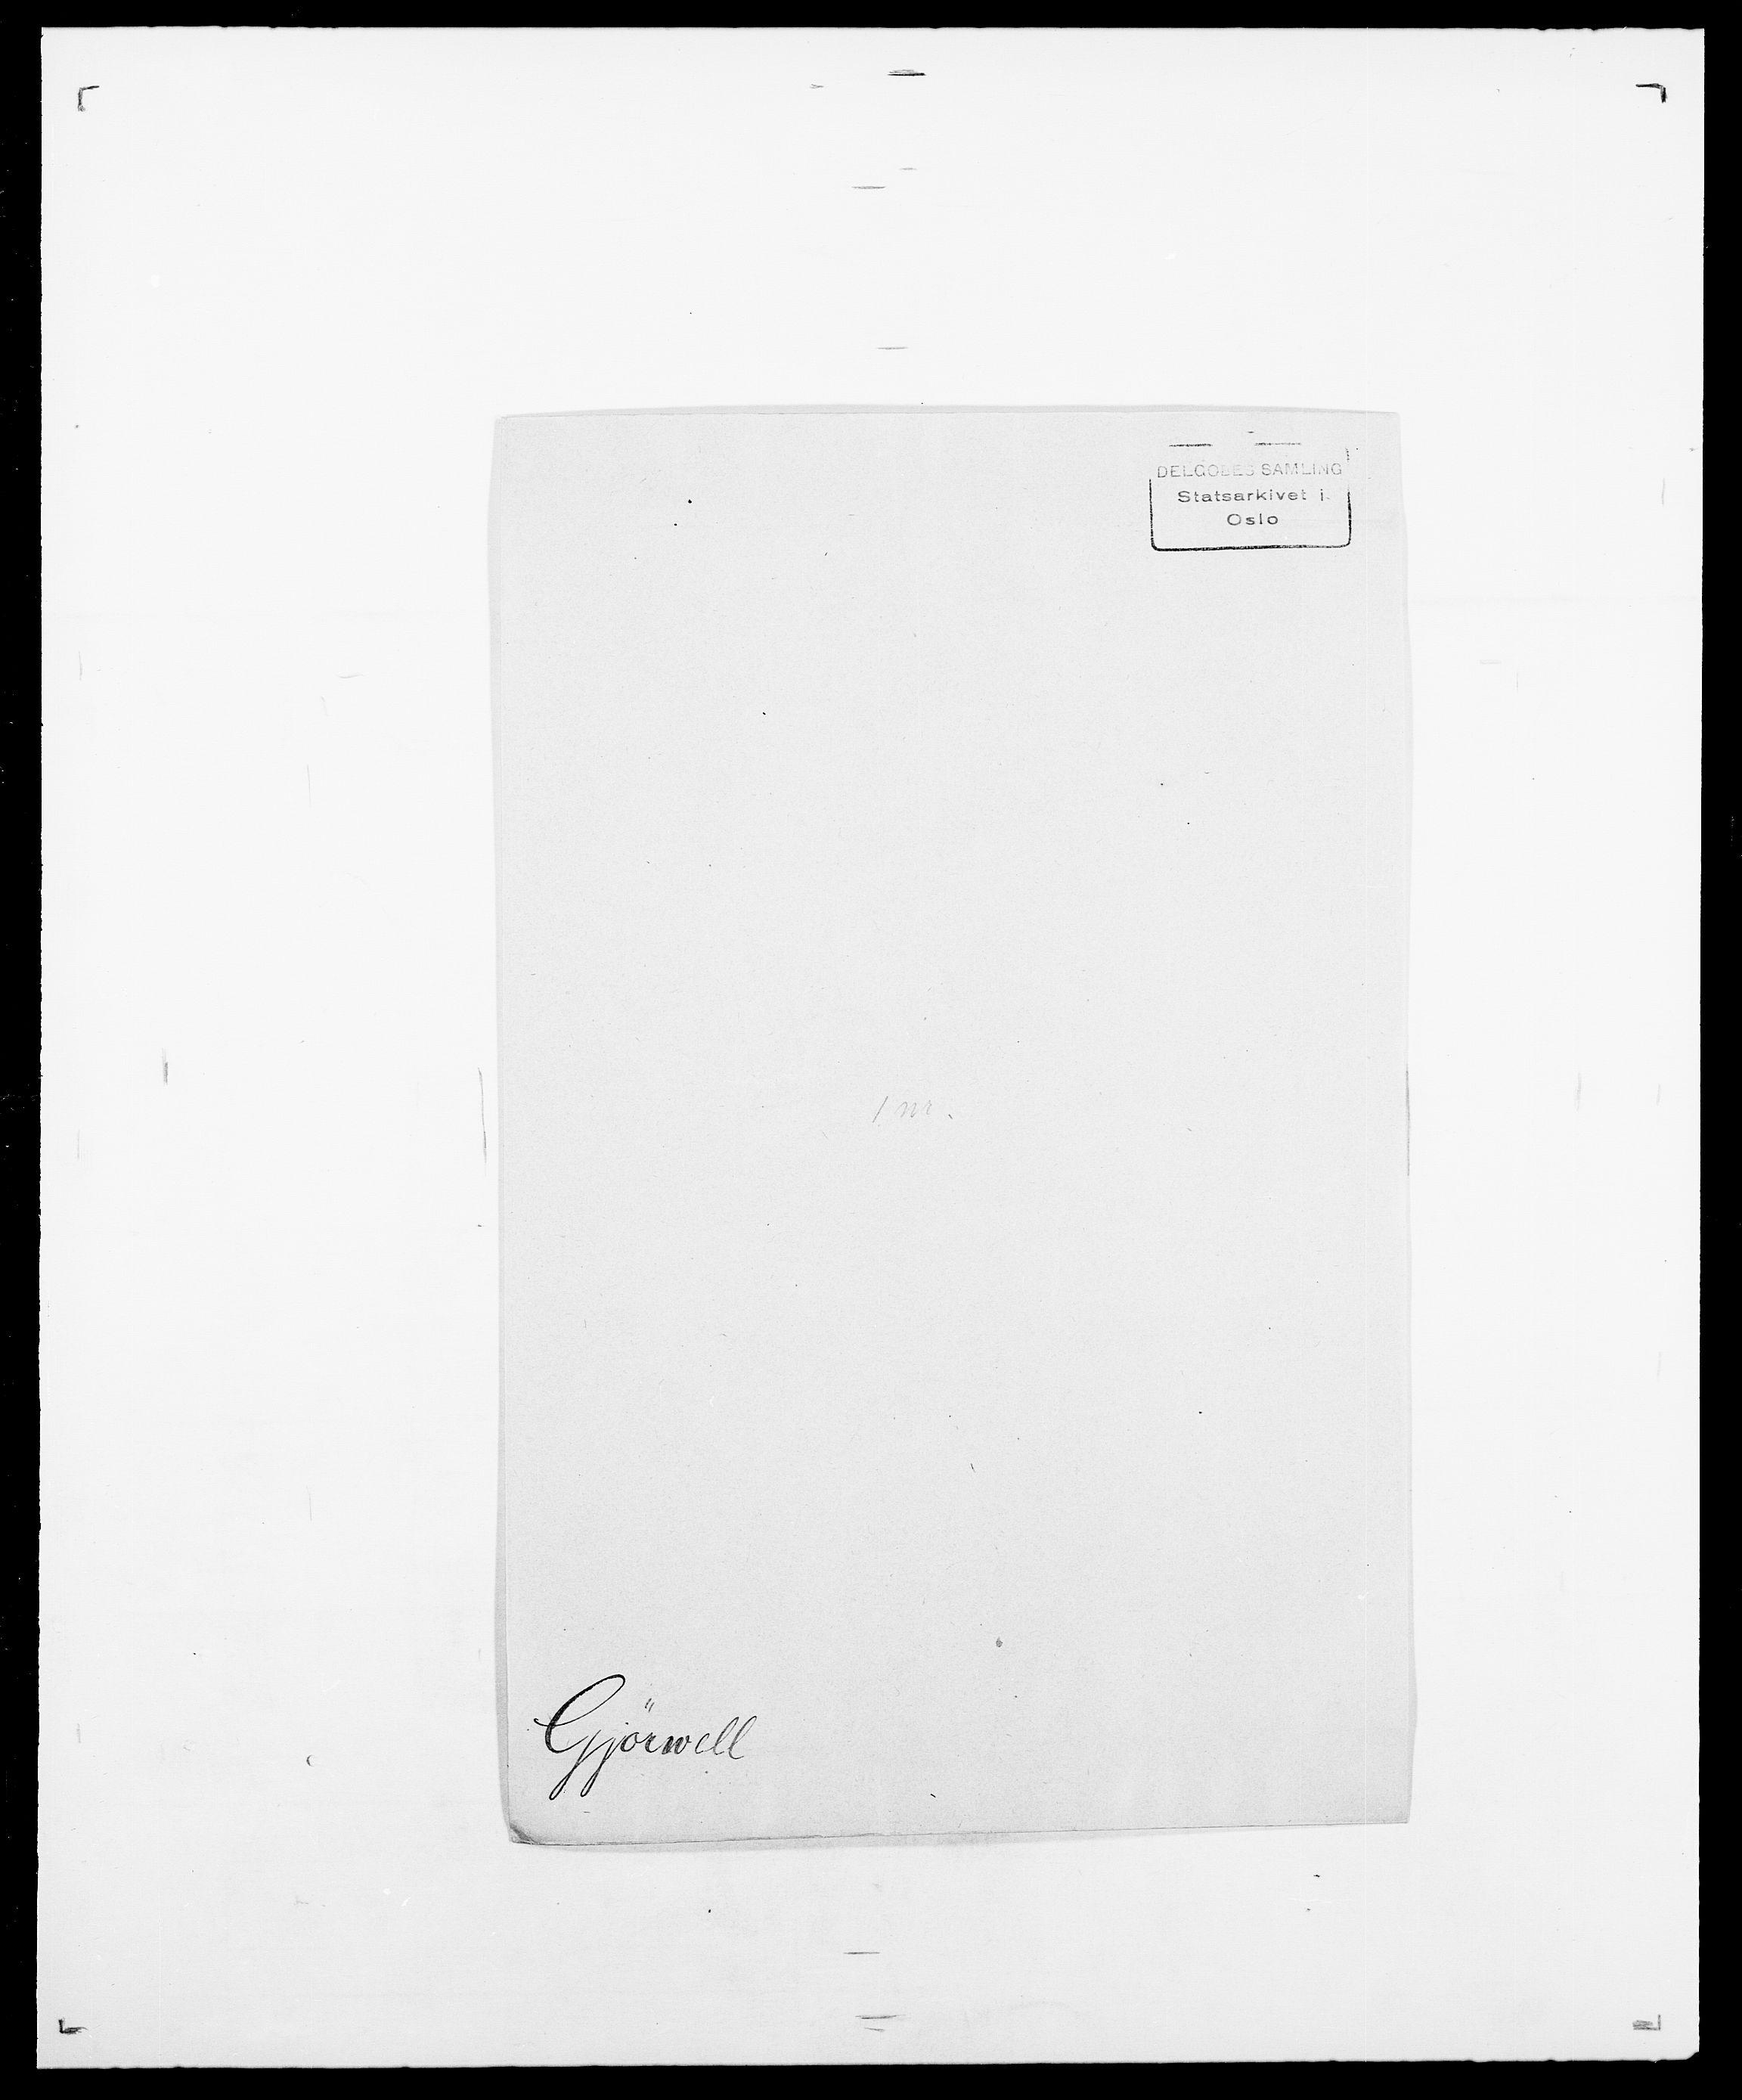 SAO, Delgobe, Charles Antoine - samling, D/Da/L0014: Giebdhausen - Grip, s. 228